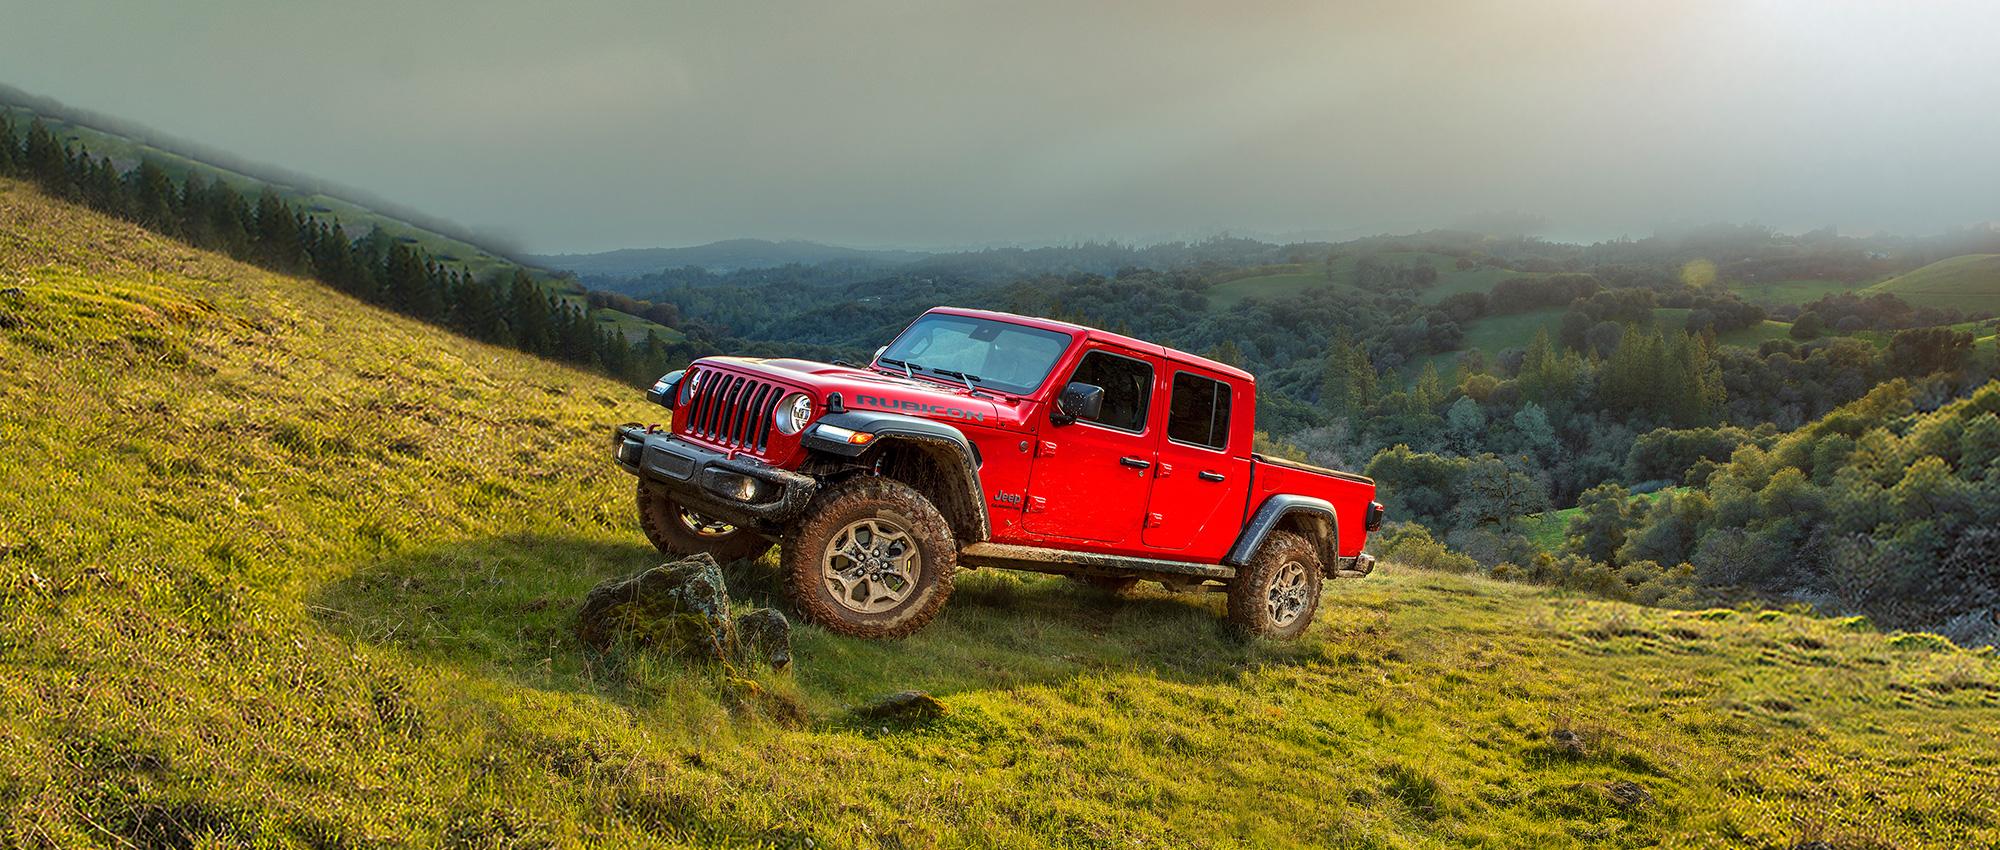 Jeep Gladiator. Please Register Your Interest Below